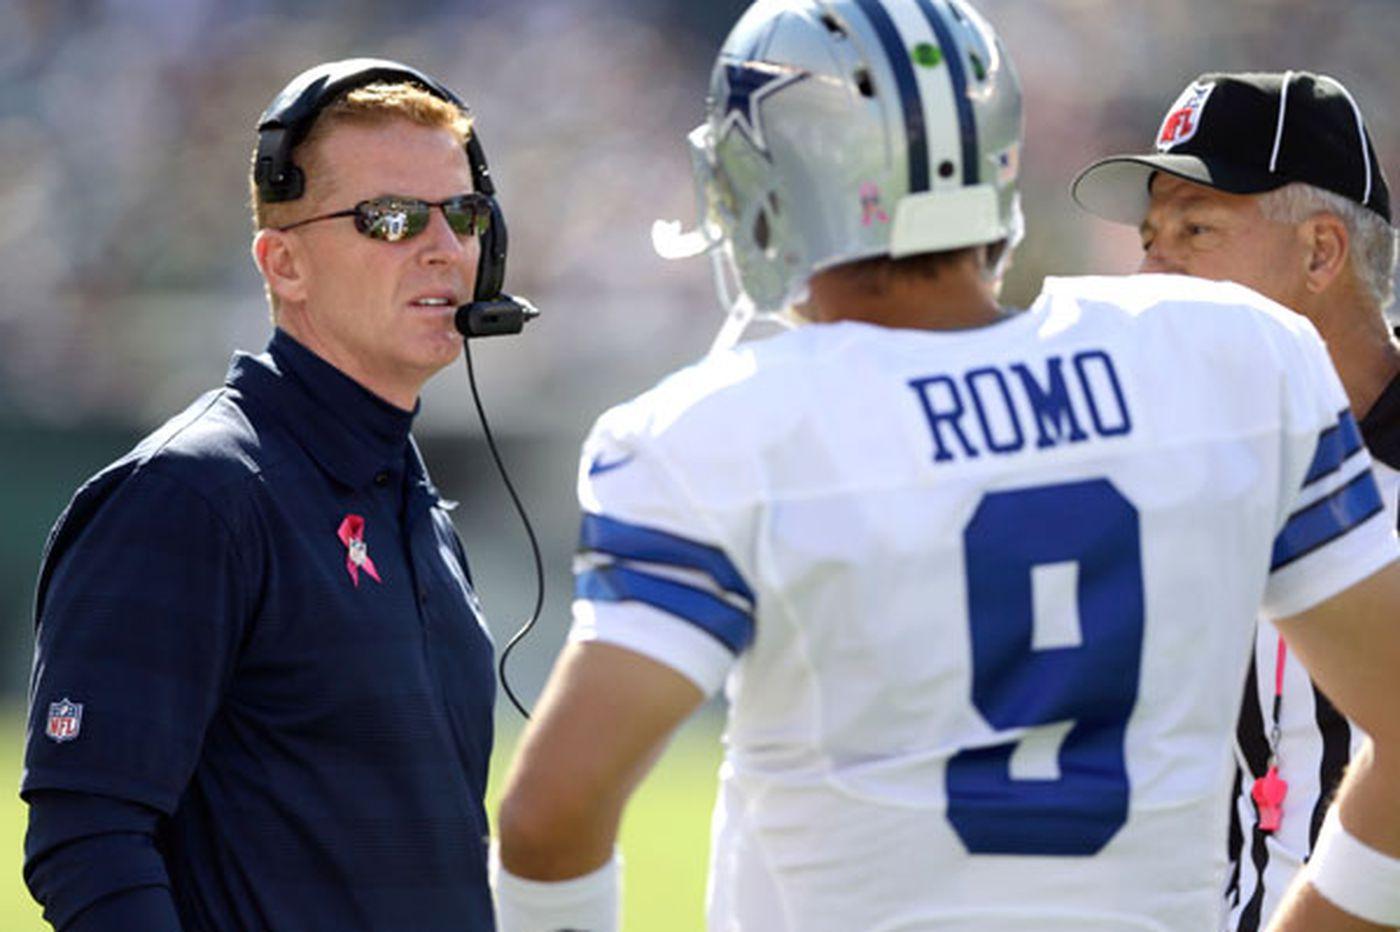 Garrett dances around Romo question